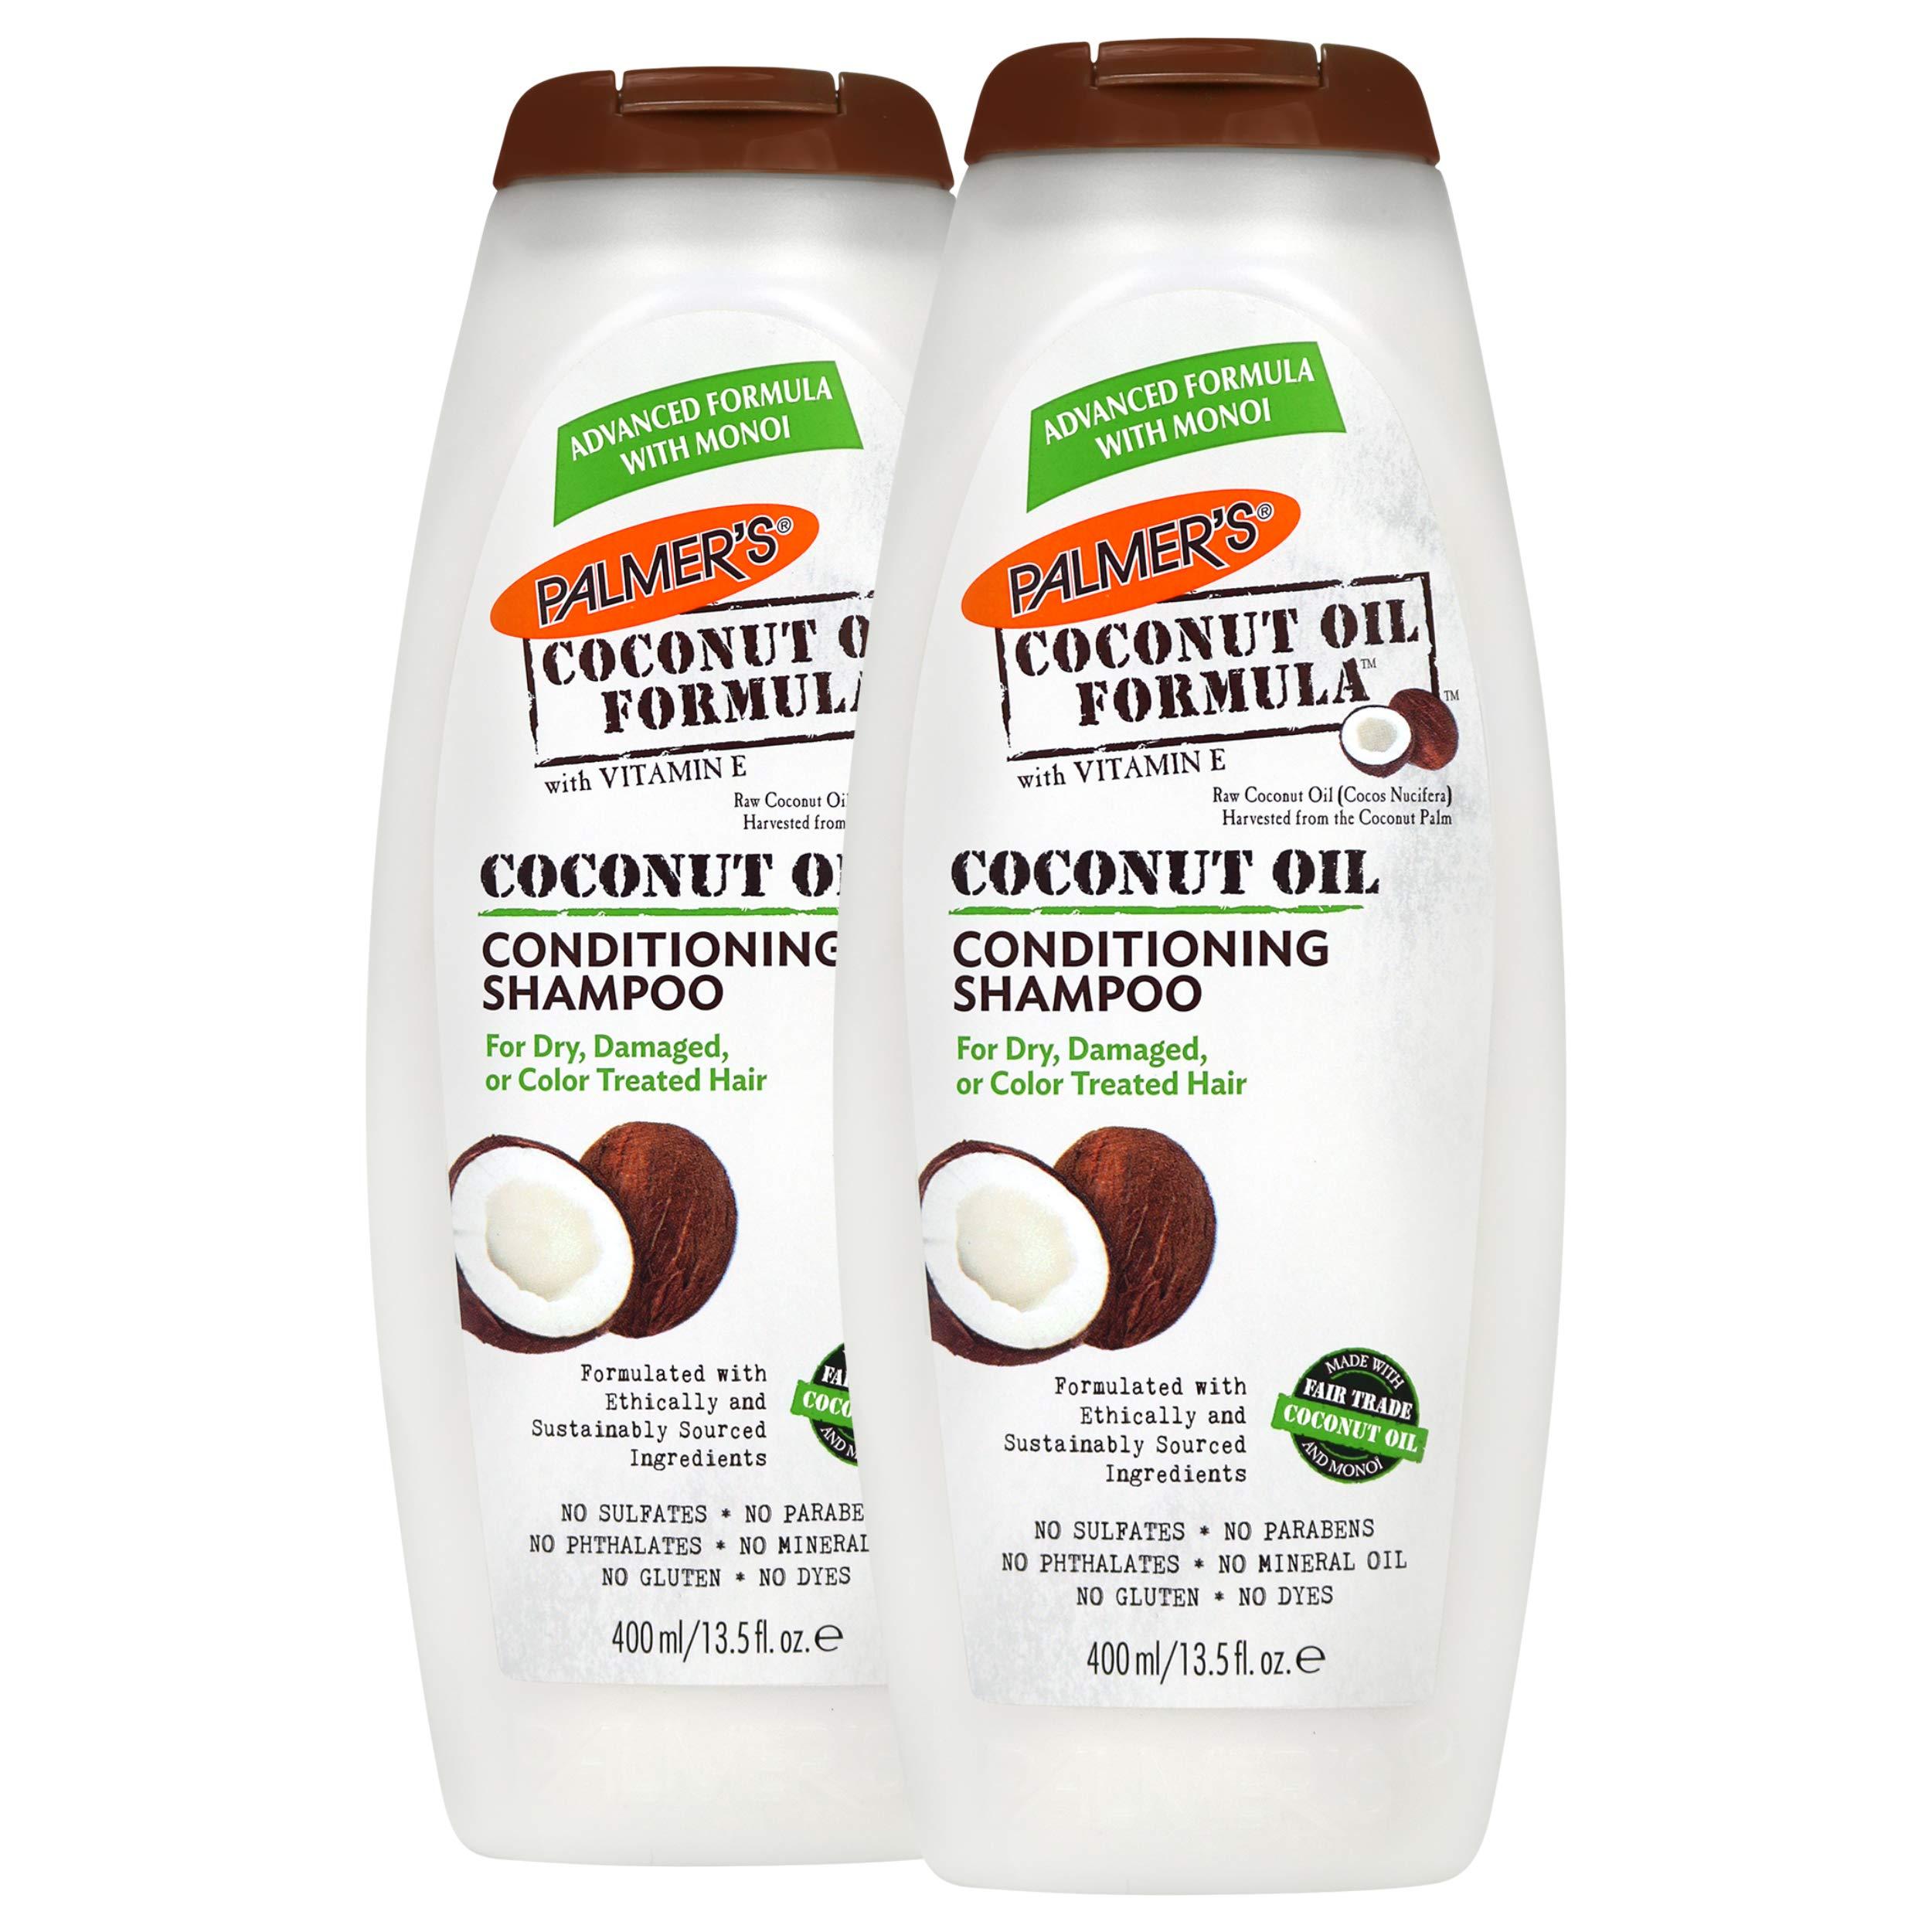 Palmers Coconut Formula Conditioning Shampoo